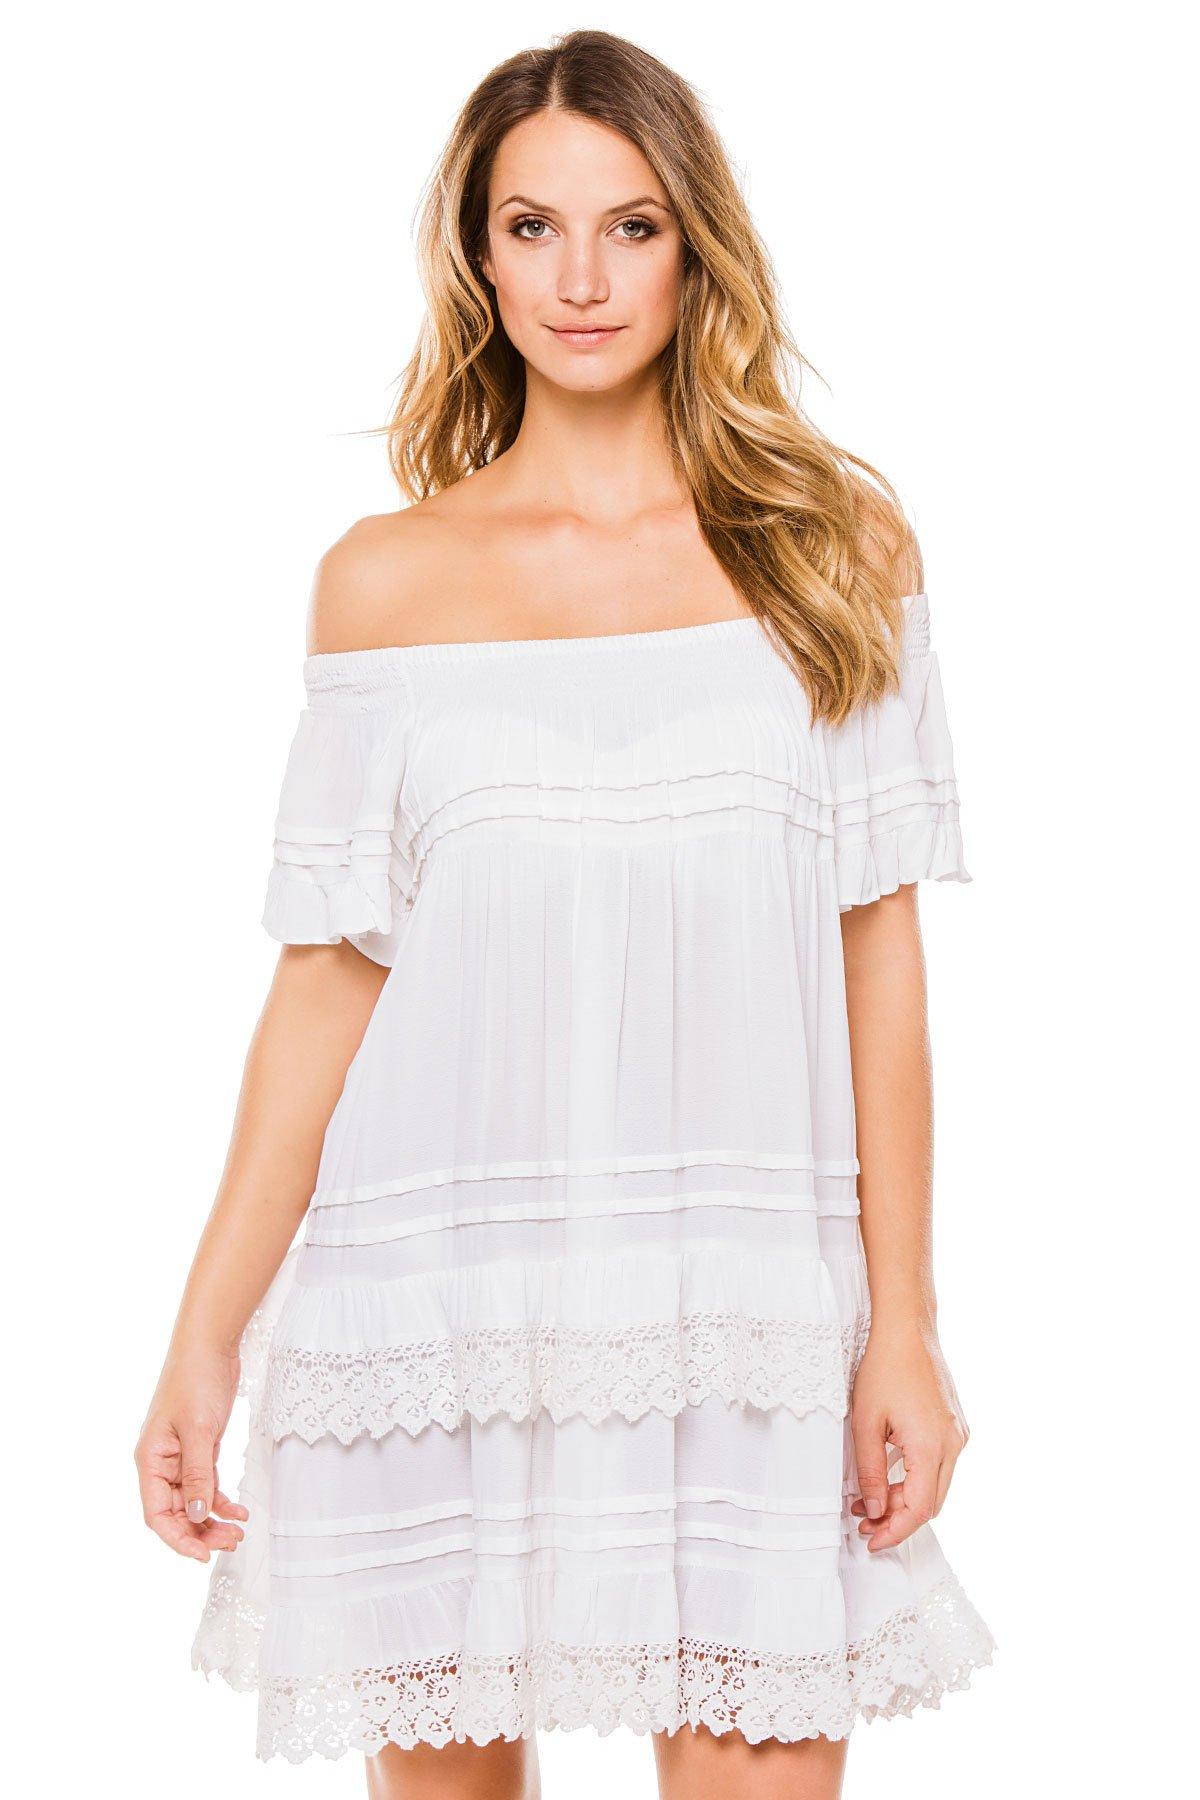 Muche et Muchette Women's Cottons Dress Swim Cover Up White One